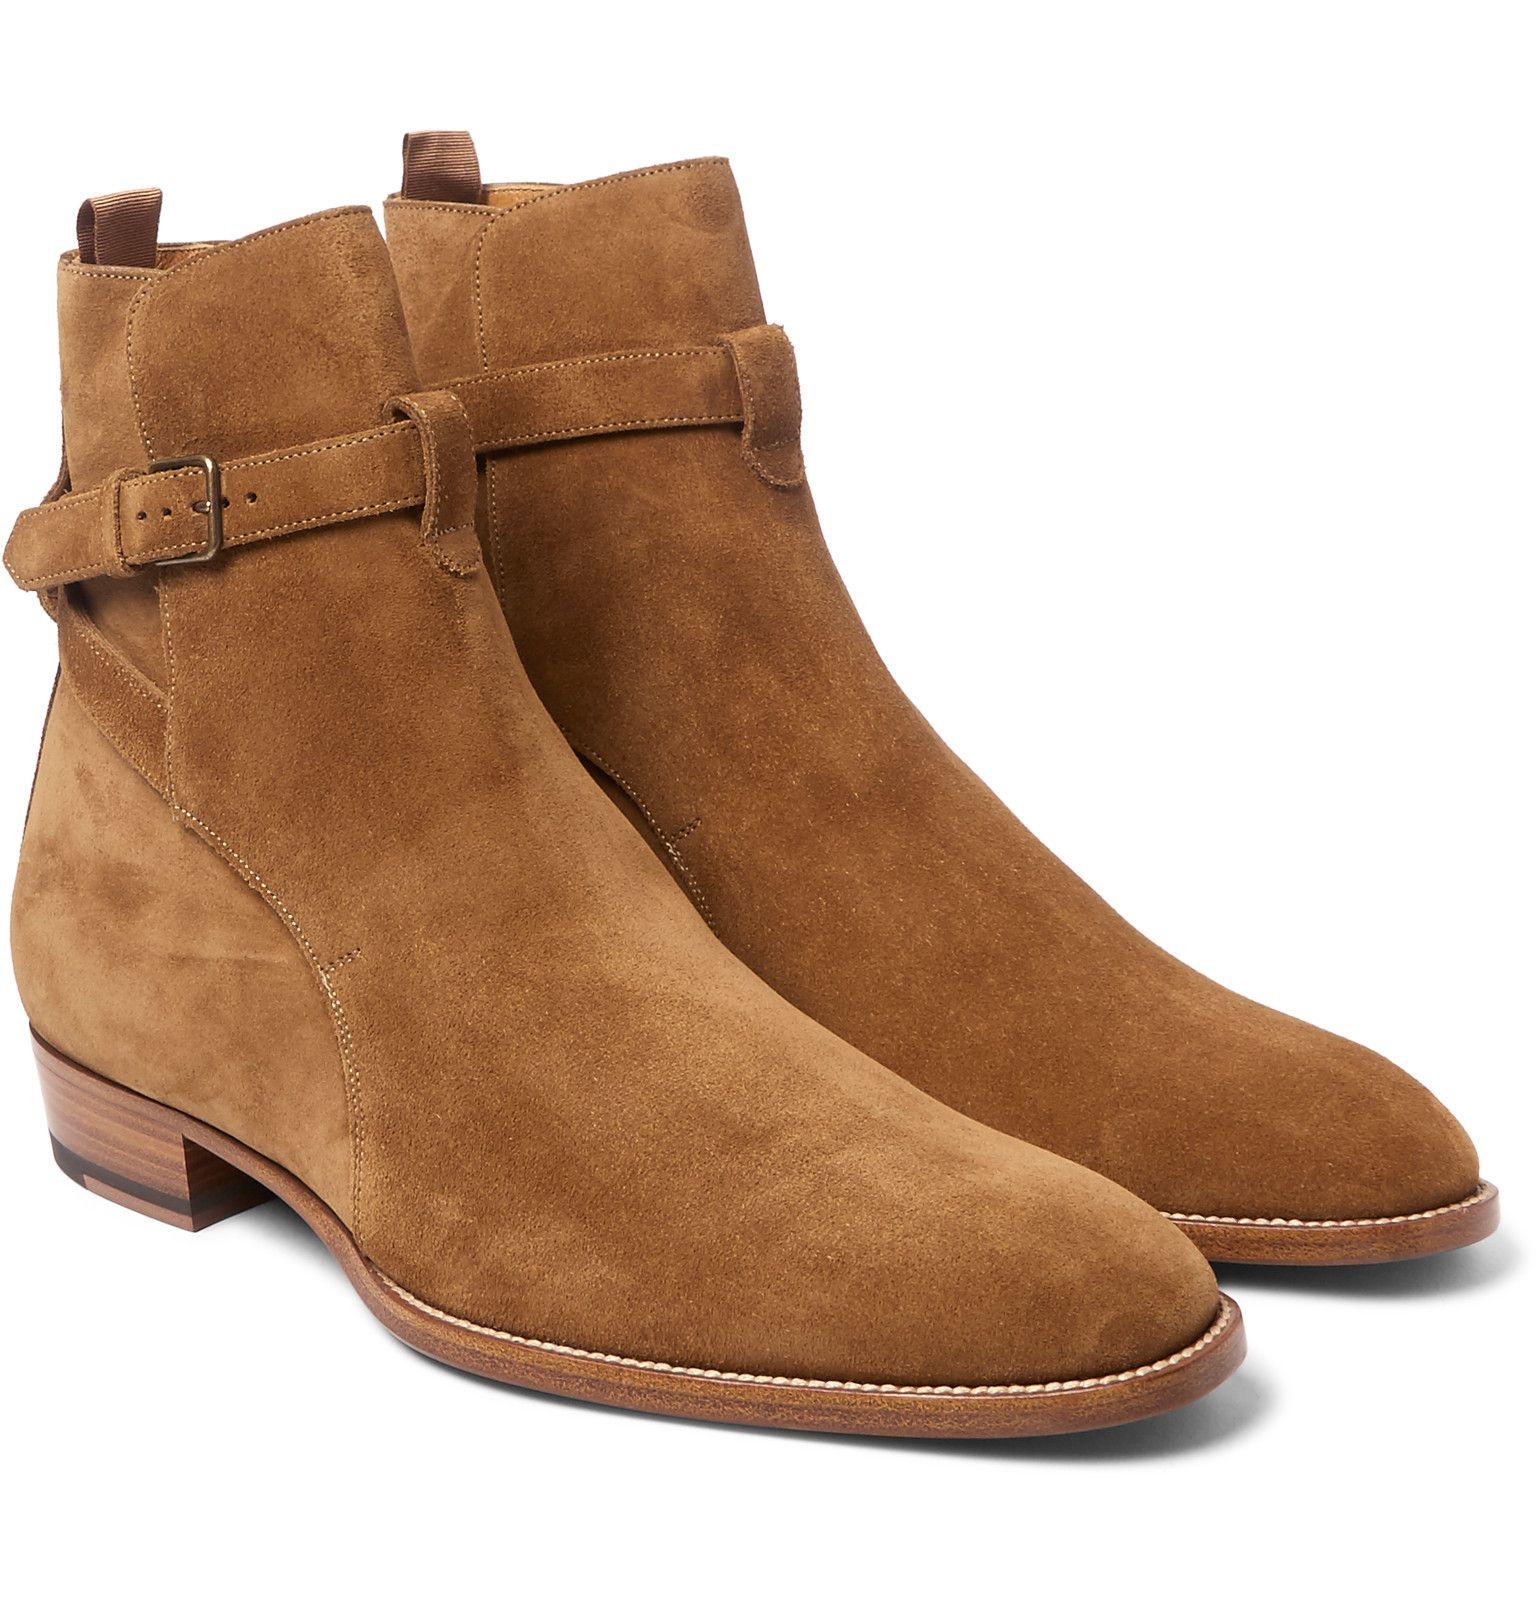 Mens leather boots, Chelsea boots men